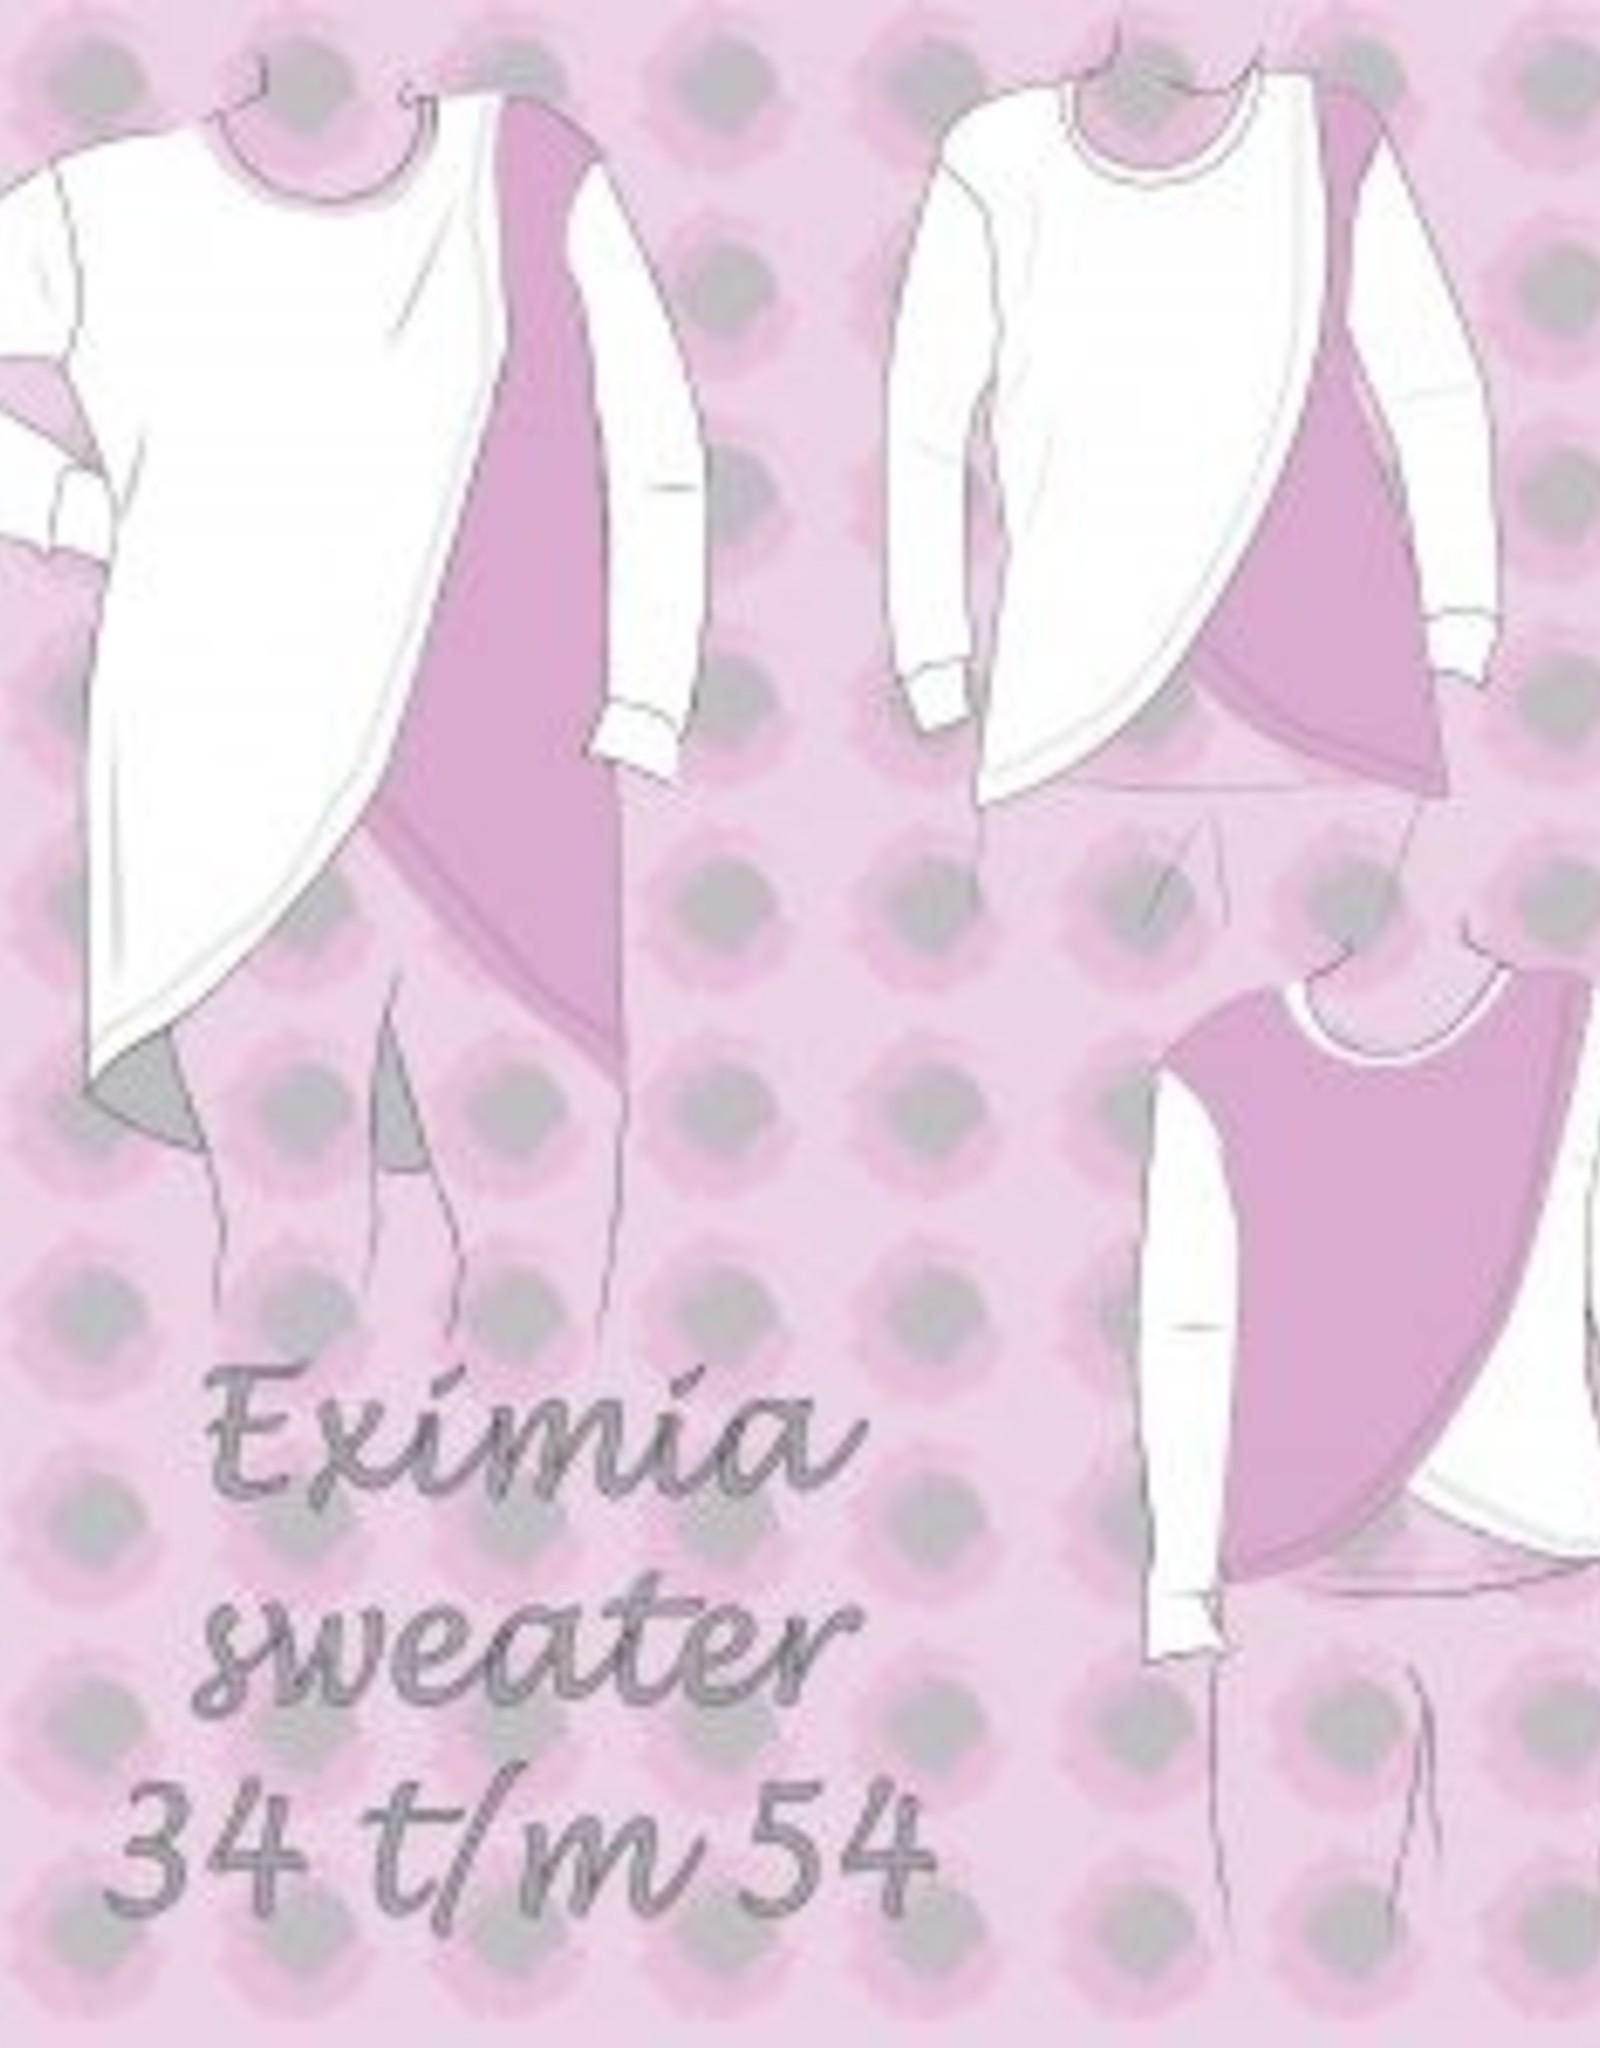 Sofilantjes Eximia Dames sweater - Sofilantjes